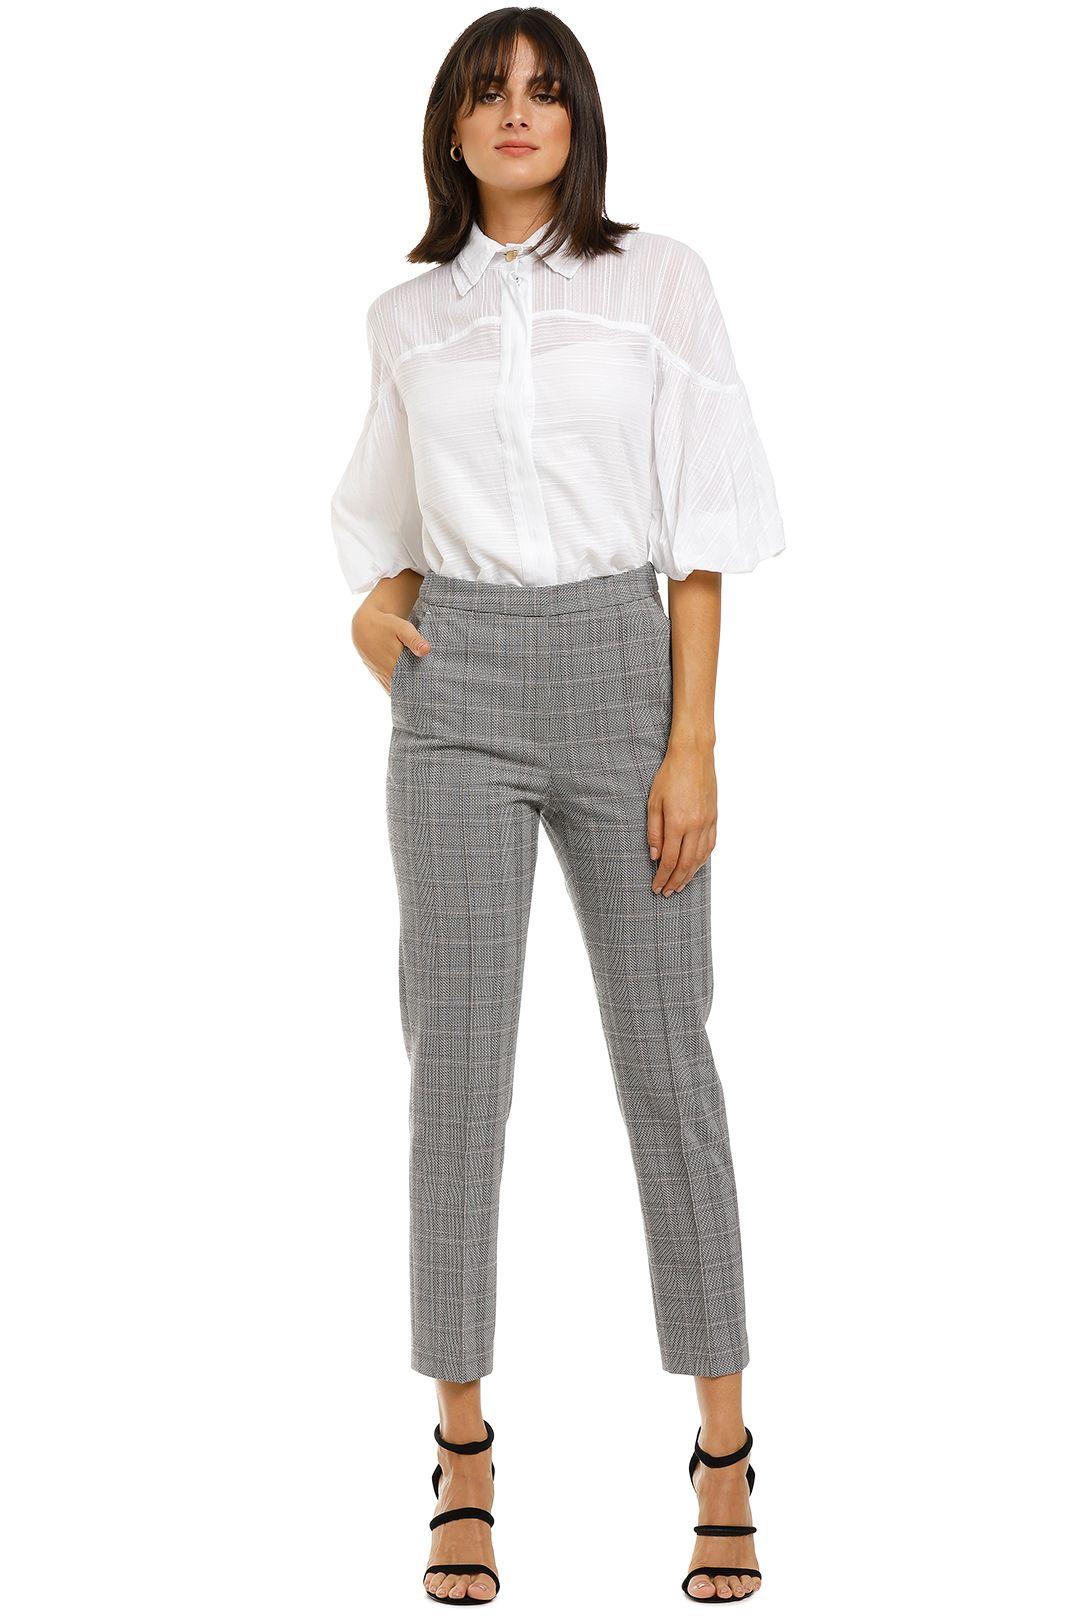 Rebecca-Margot-Slim-Pant-Grey-Check-Front